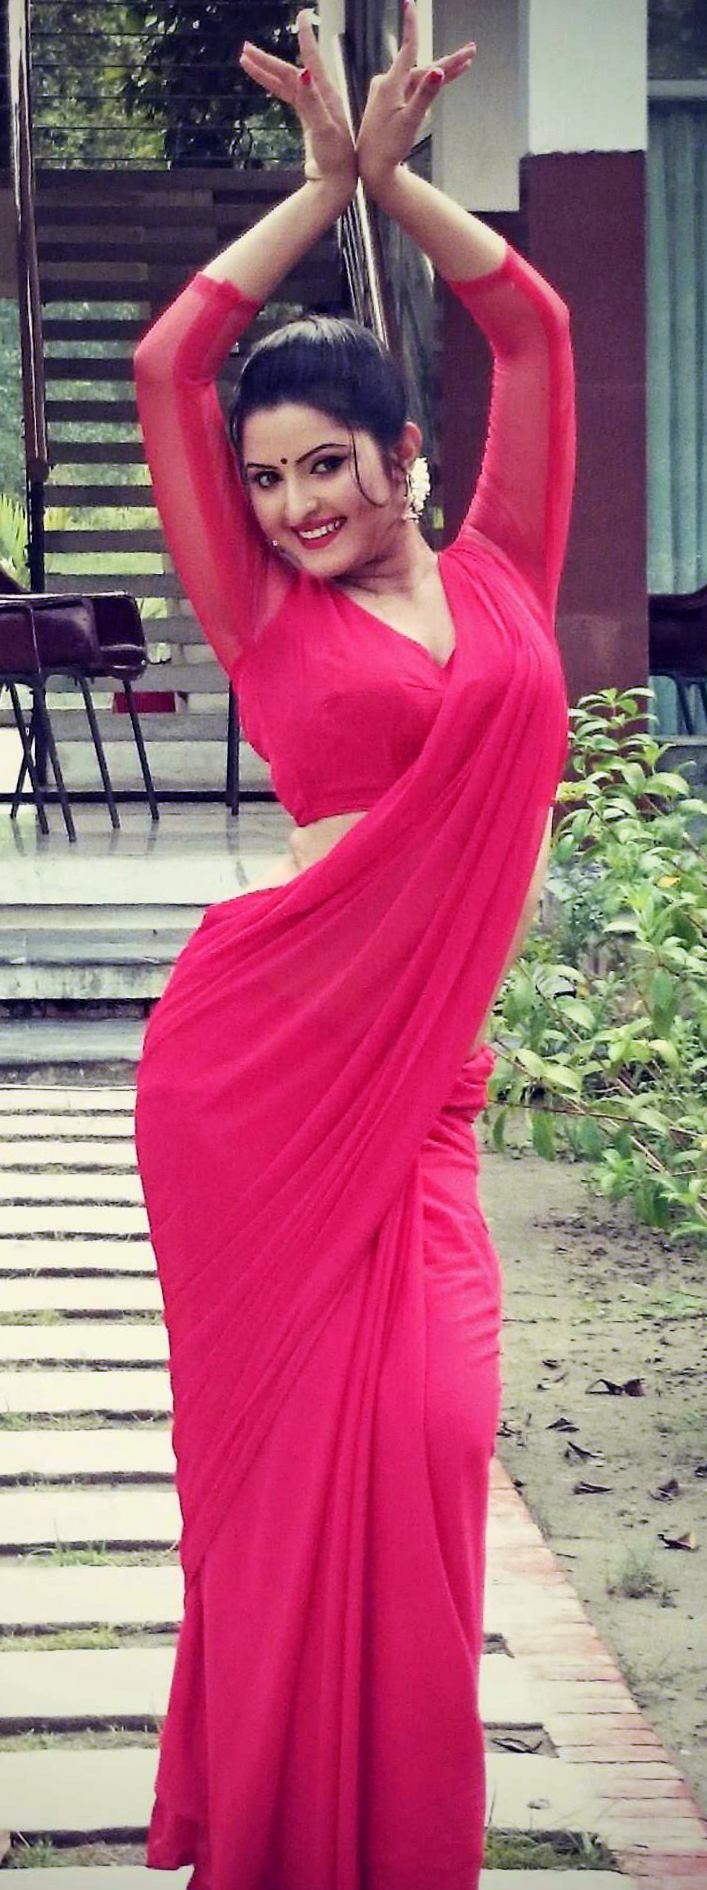 Pori Moni Bangladeshi Model Actress Image Photo Wallpapers